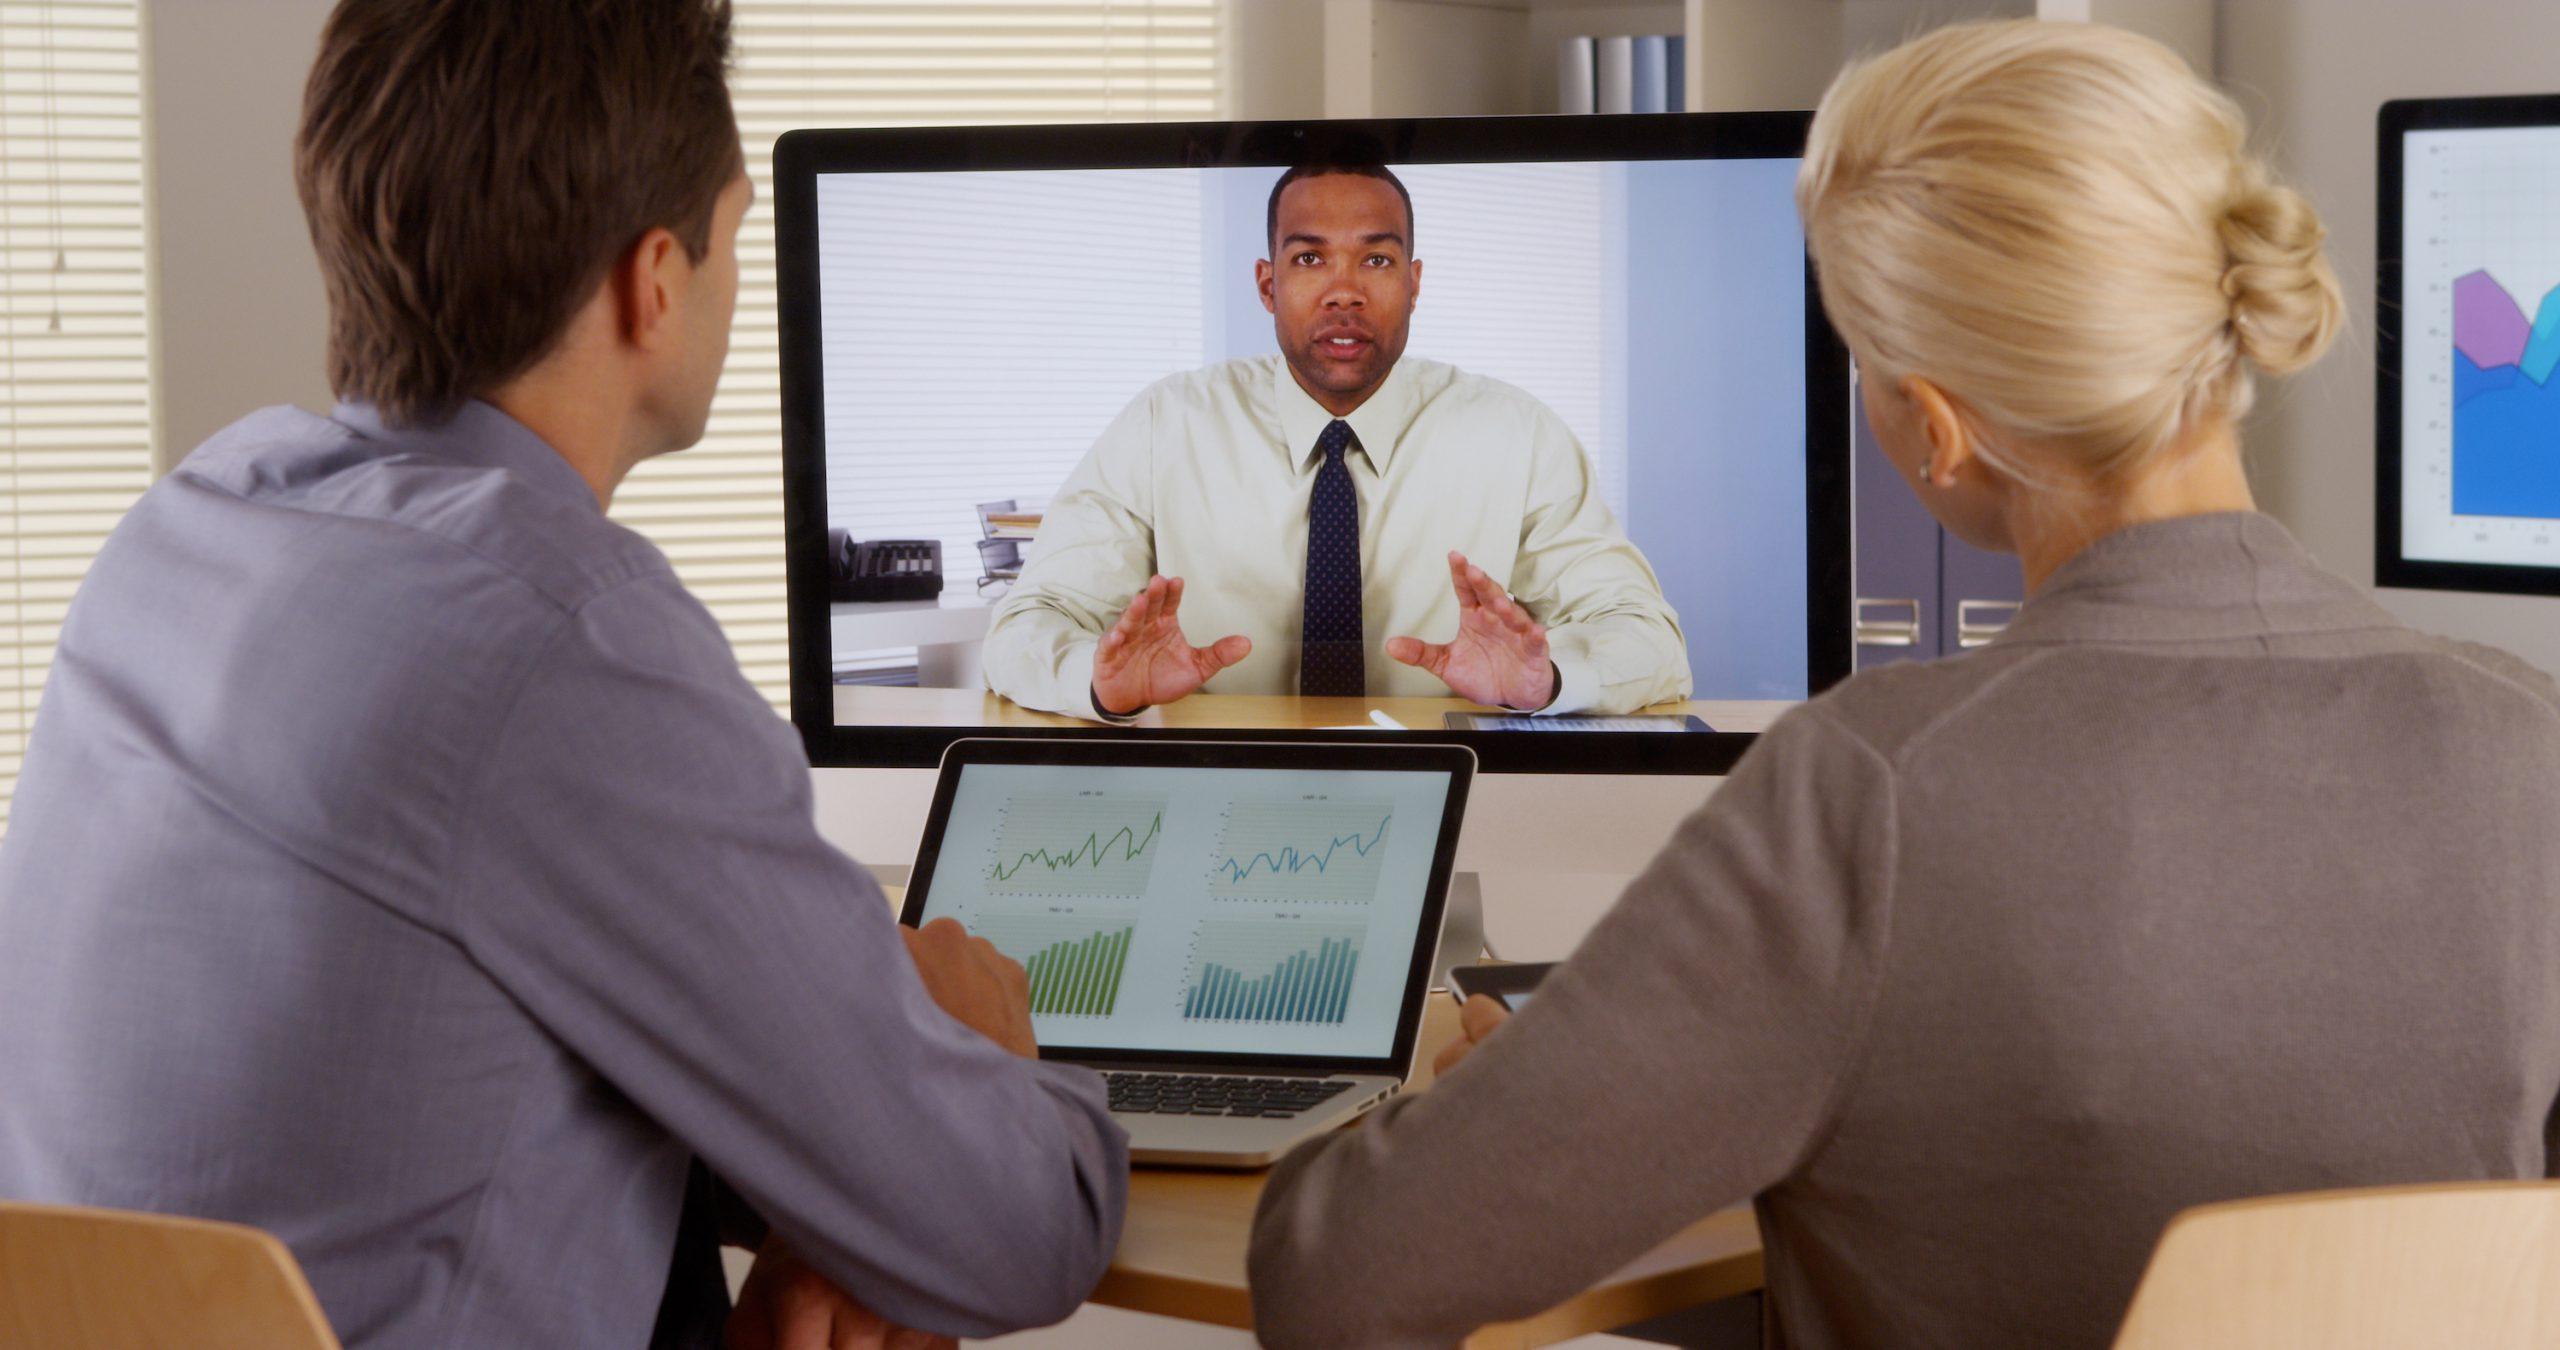 remote employee monitoring